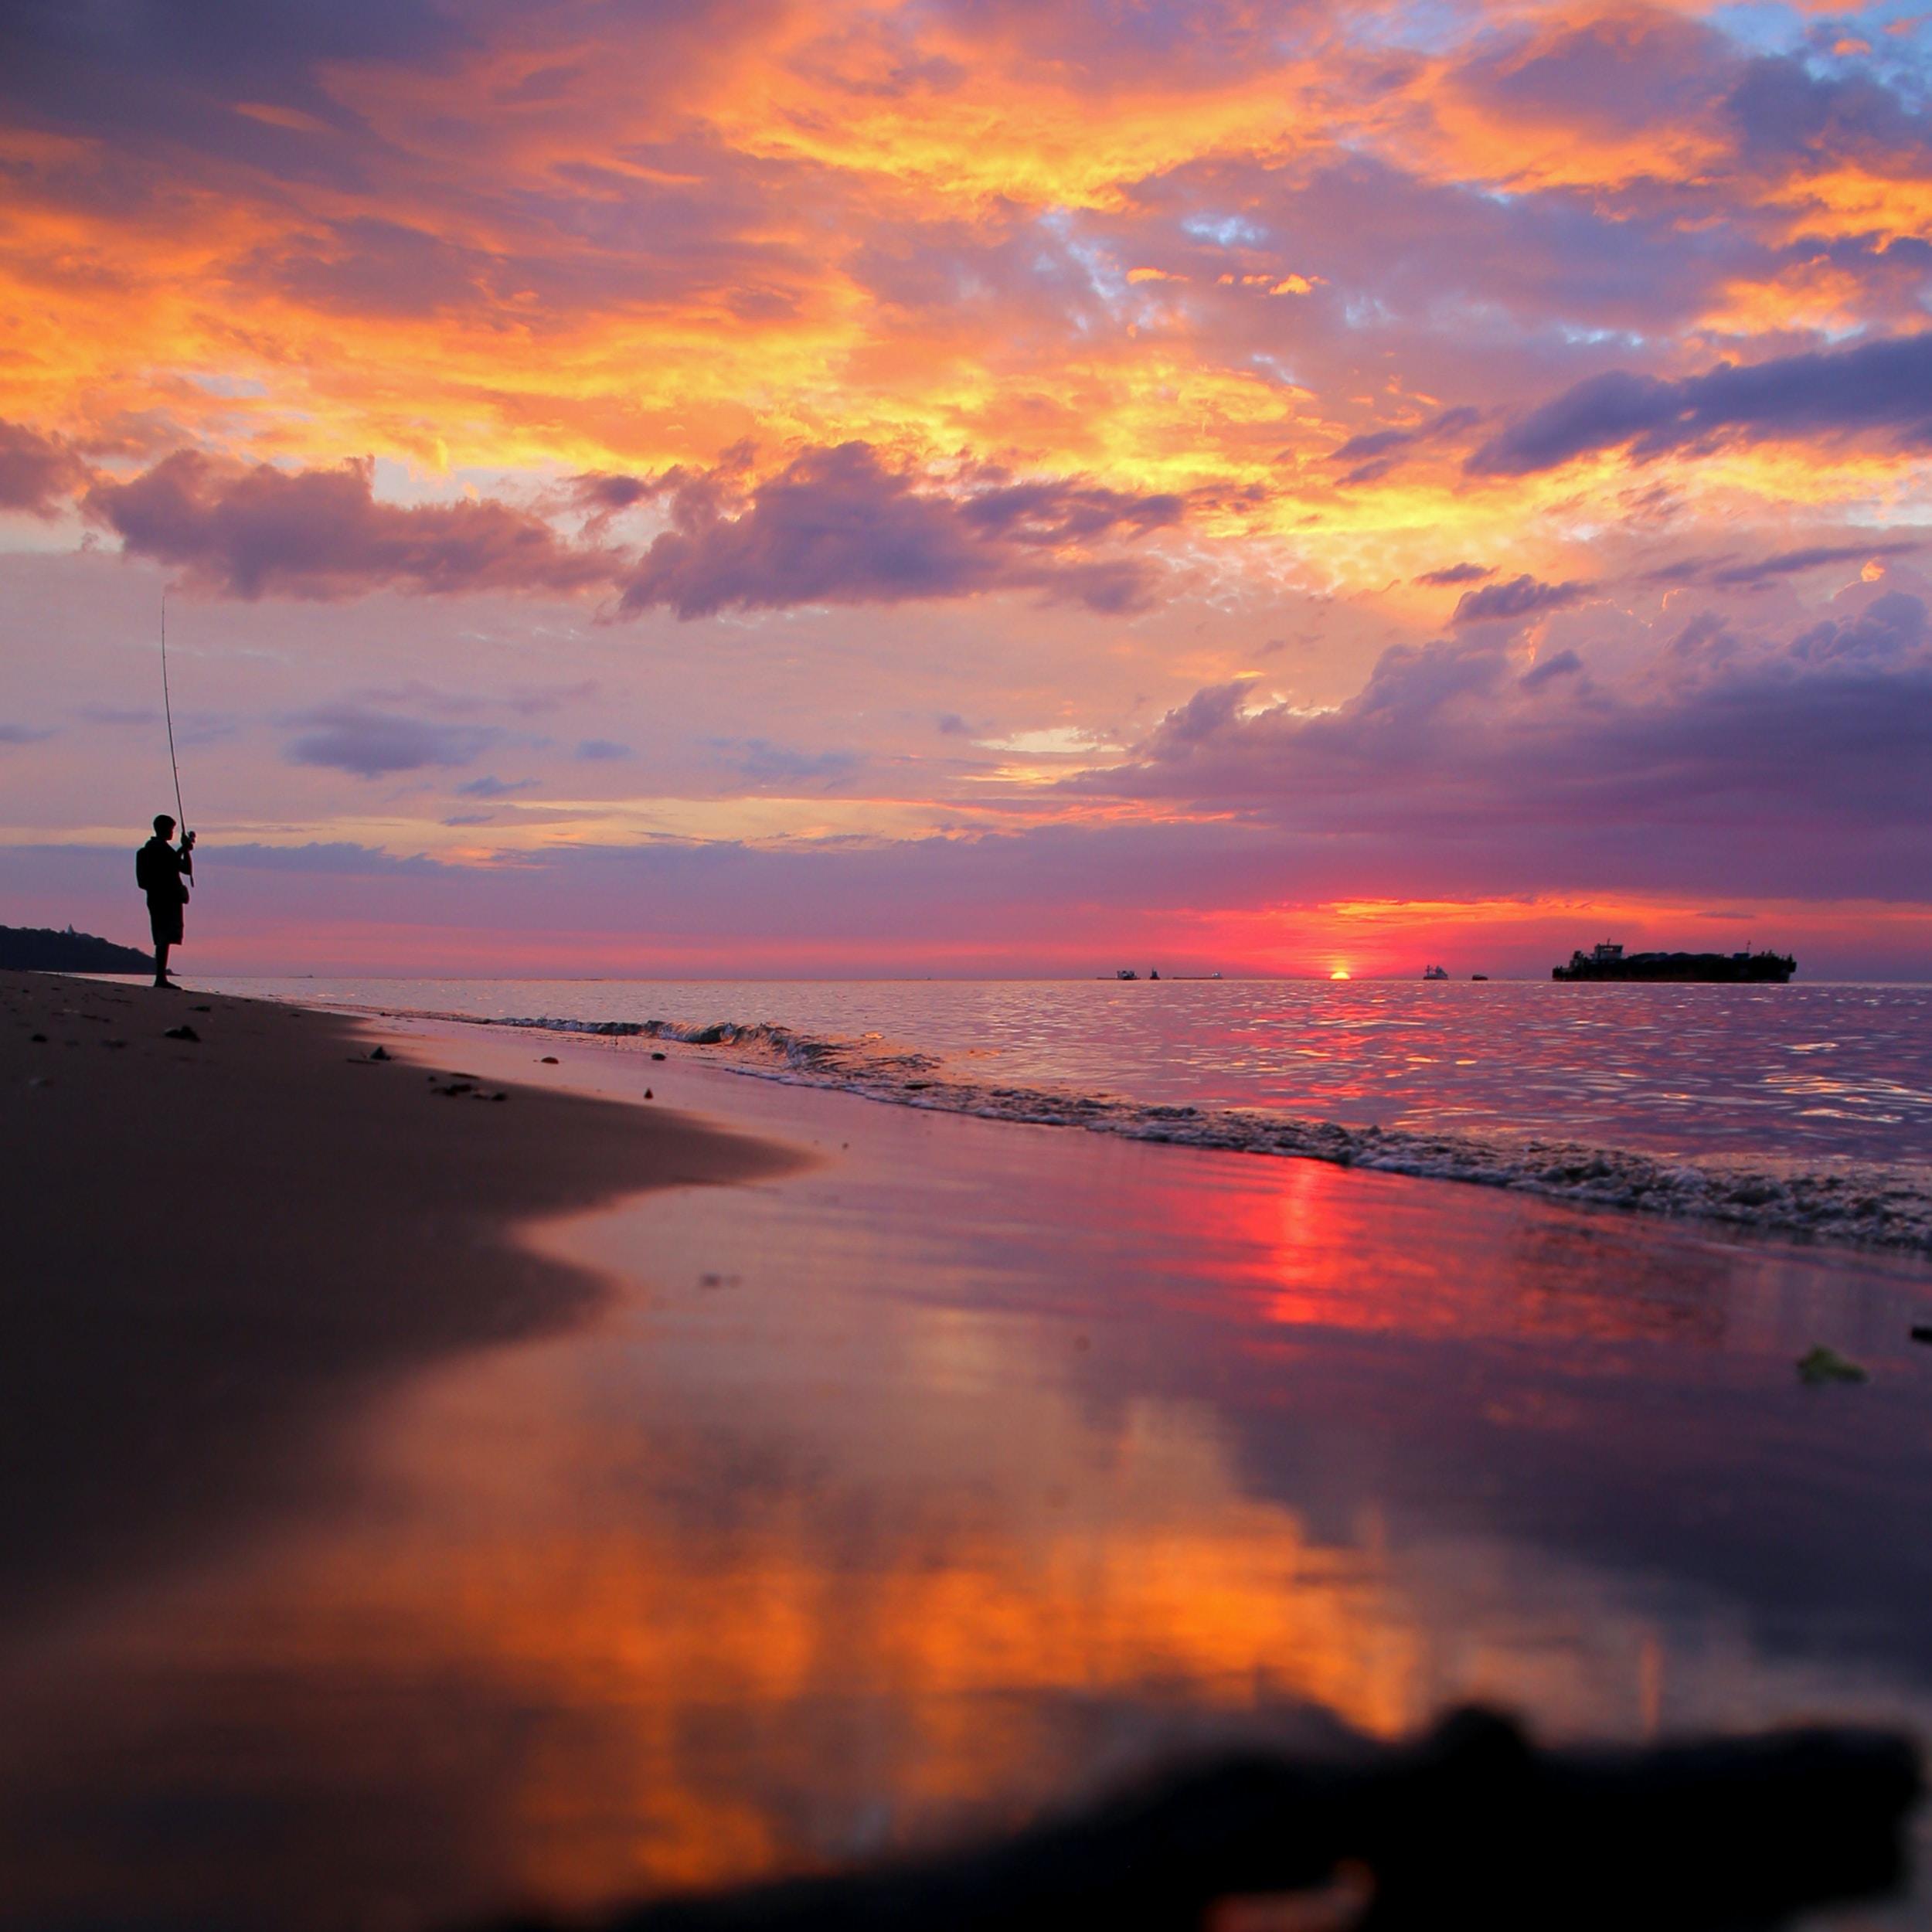 man standing on seashore during golden hour